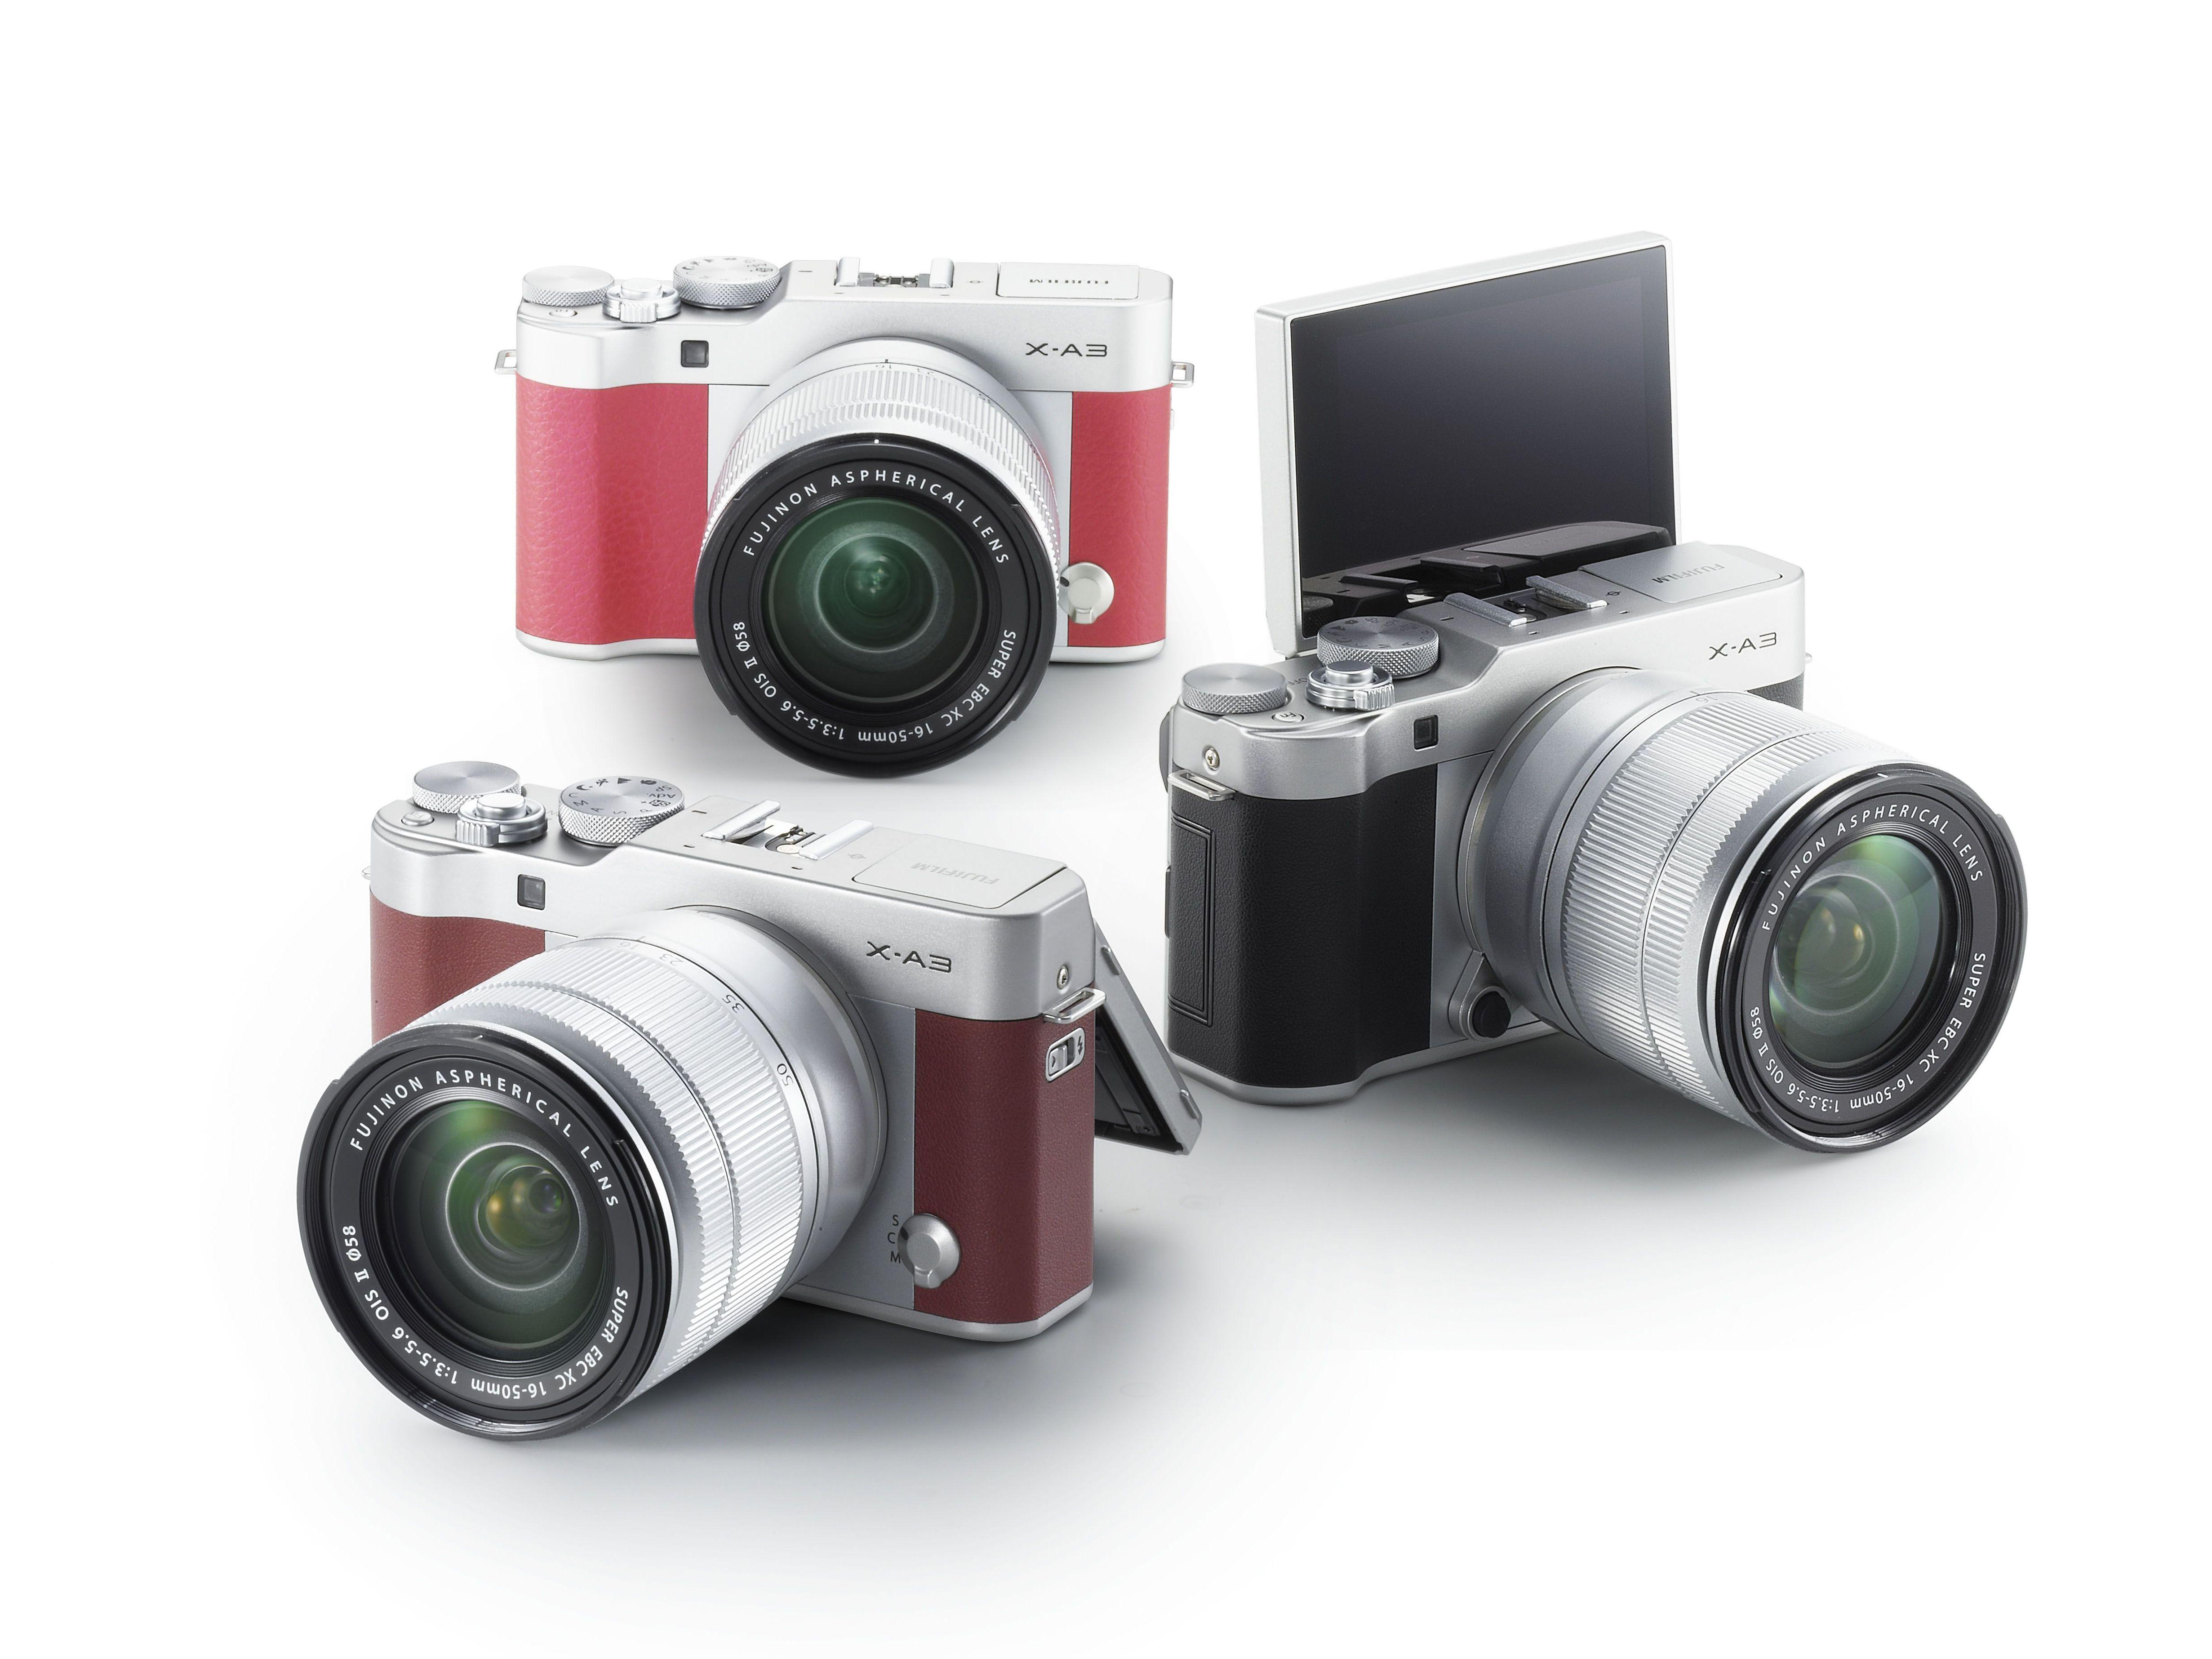 Fujifilm X A3 design